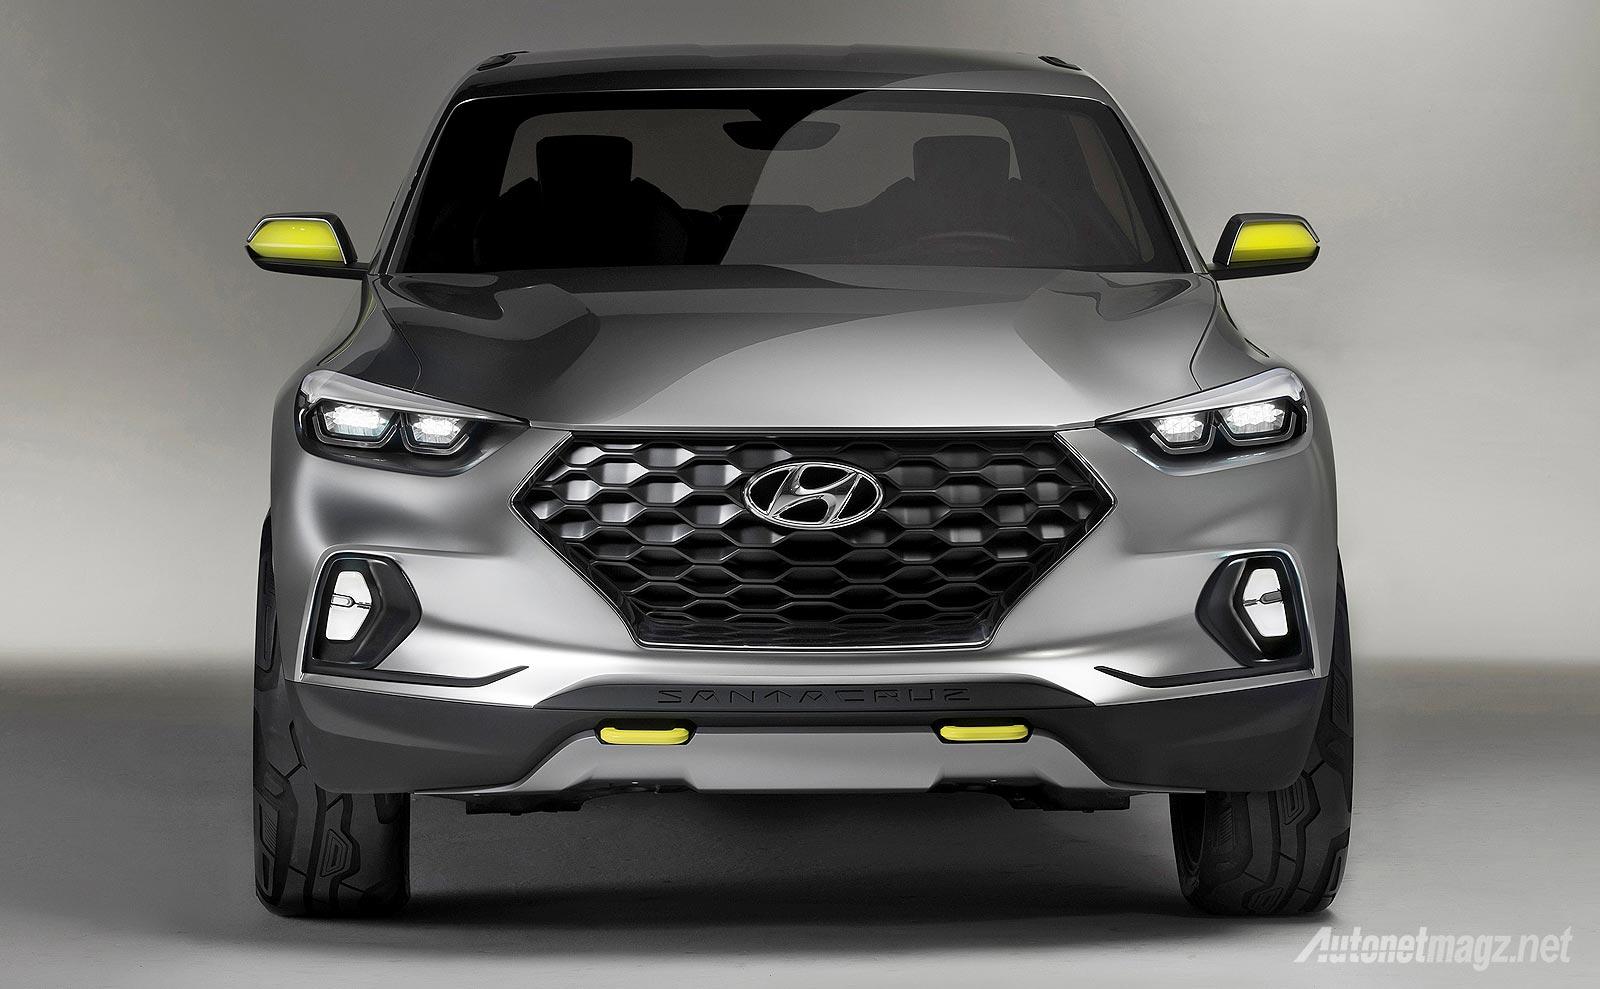 Hyundai, SUV truck terbaru Hyundai Santa Cruz concept 2015: Hyundai Santa Cruz Concept Mencuri Perhatian di Detroit Auto Show 2015